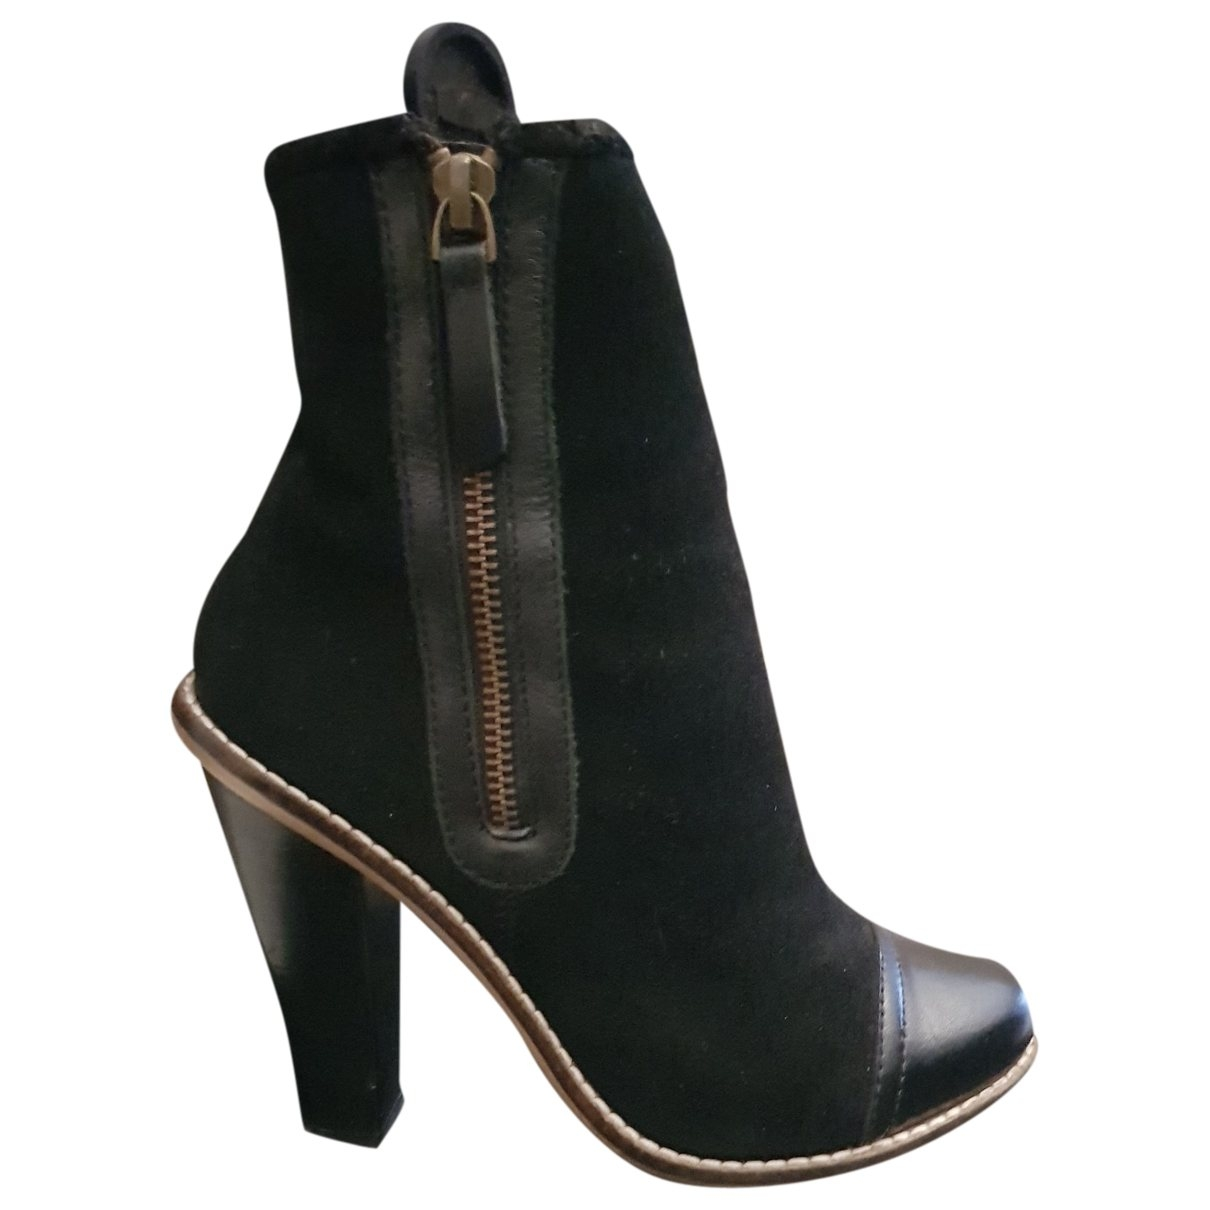 Mango \N Black Leather Boots for Women 36 EU